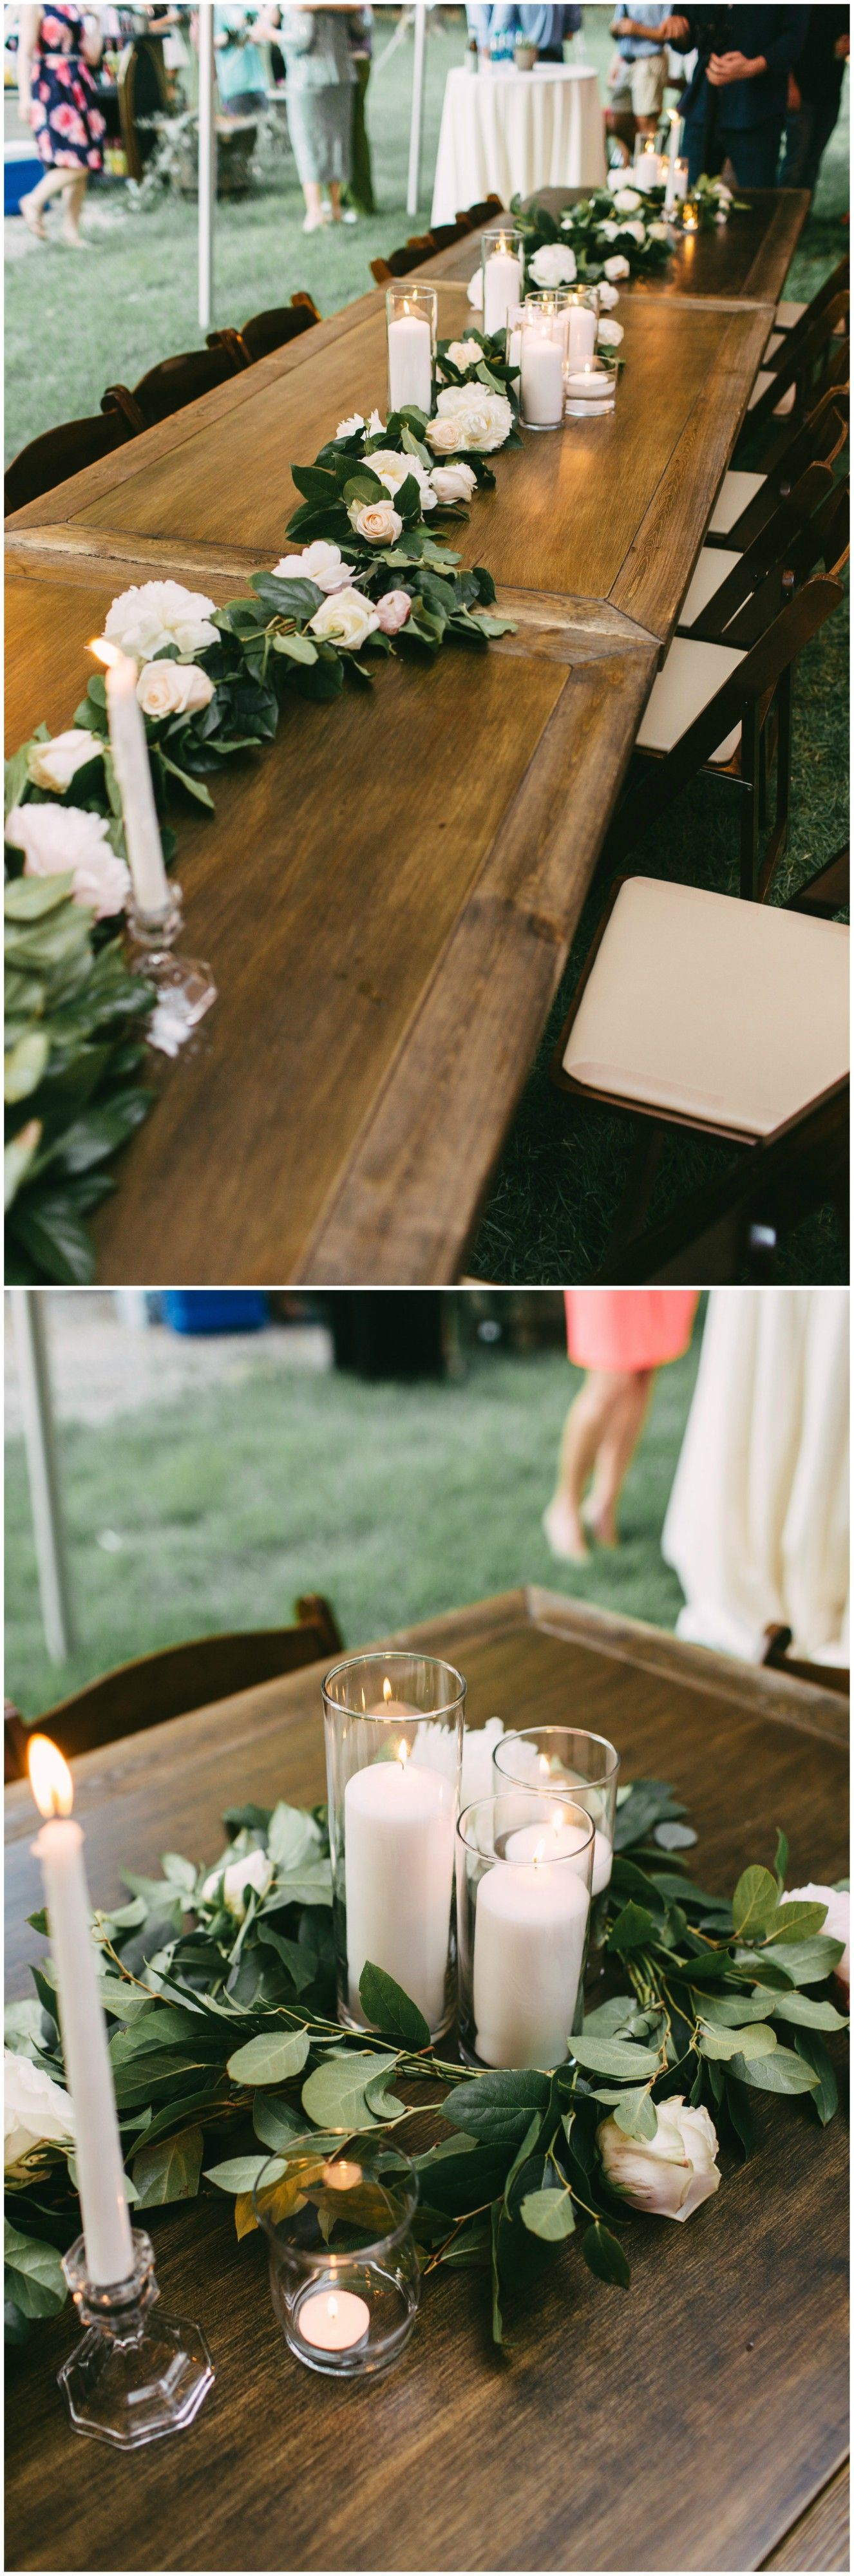 Outdoor Wedding Reception Table Decor Long Wooden Tables Garlands Of Pastel Flroals An Wedding Reception Table Decorations Wedding Table Wedding Centerpieces